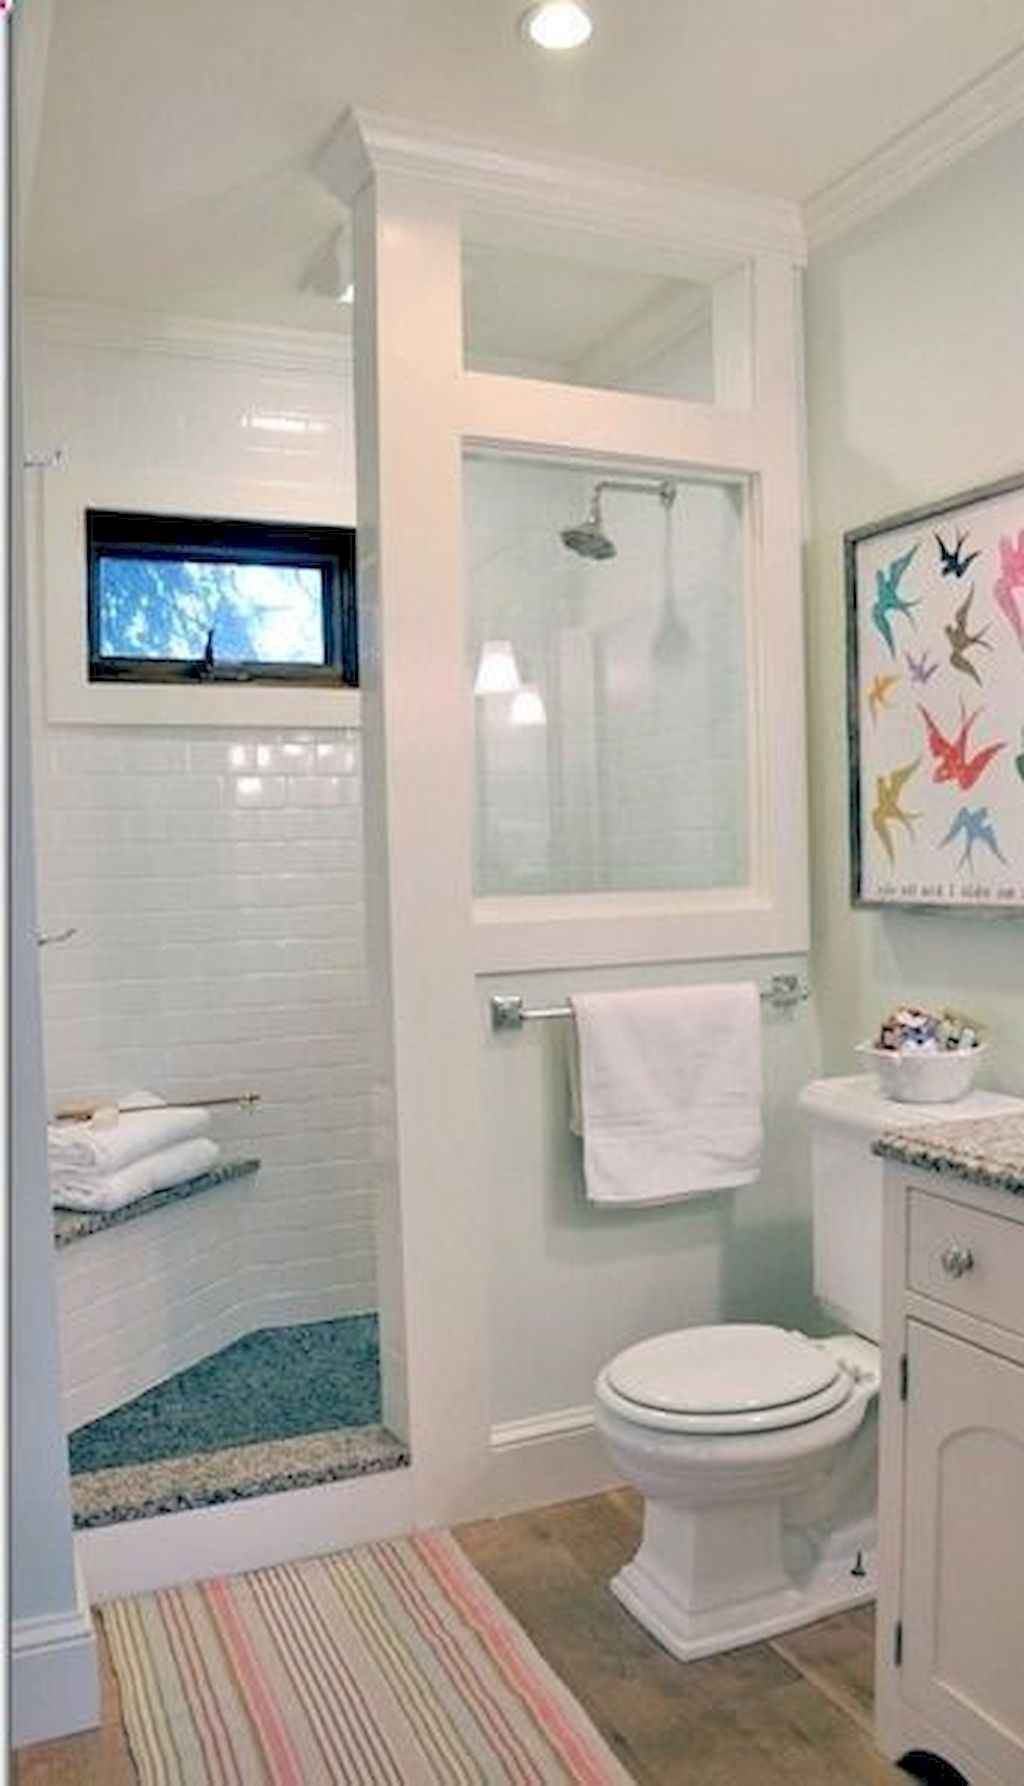 Inspiring apartment bathroom remodel ideas on a budget (3)